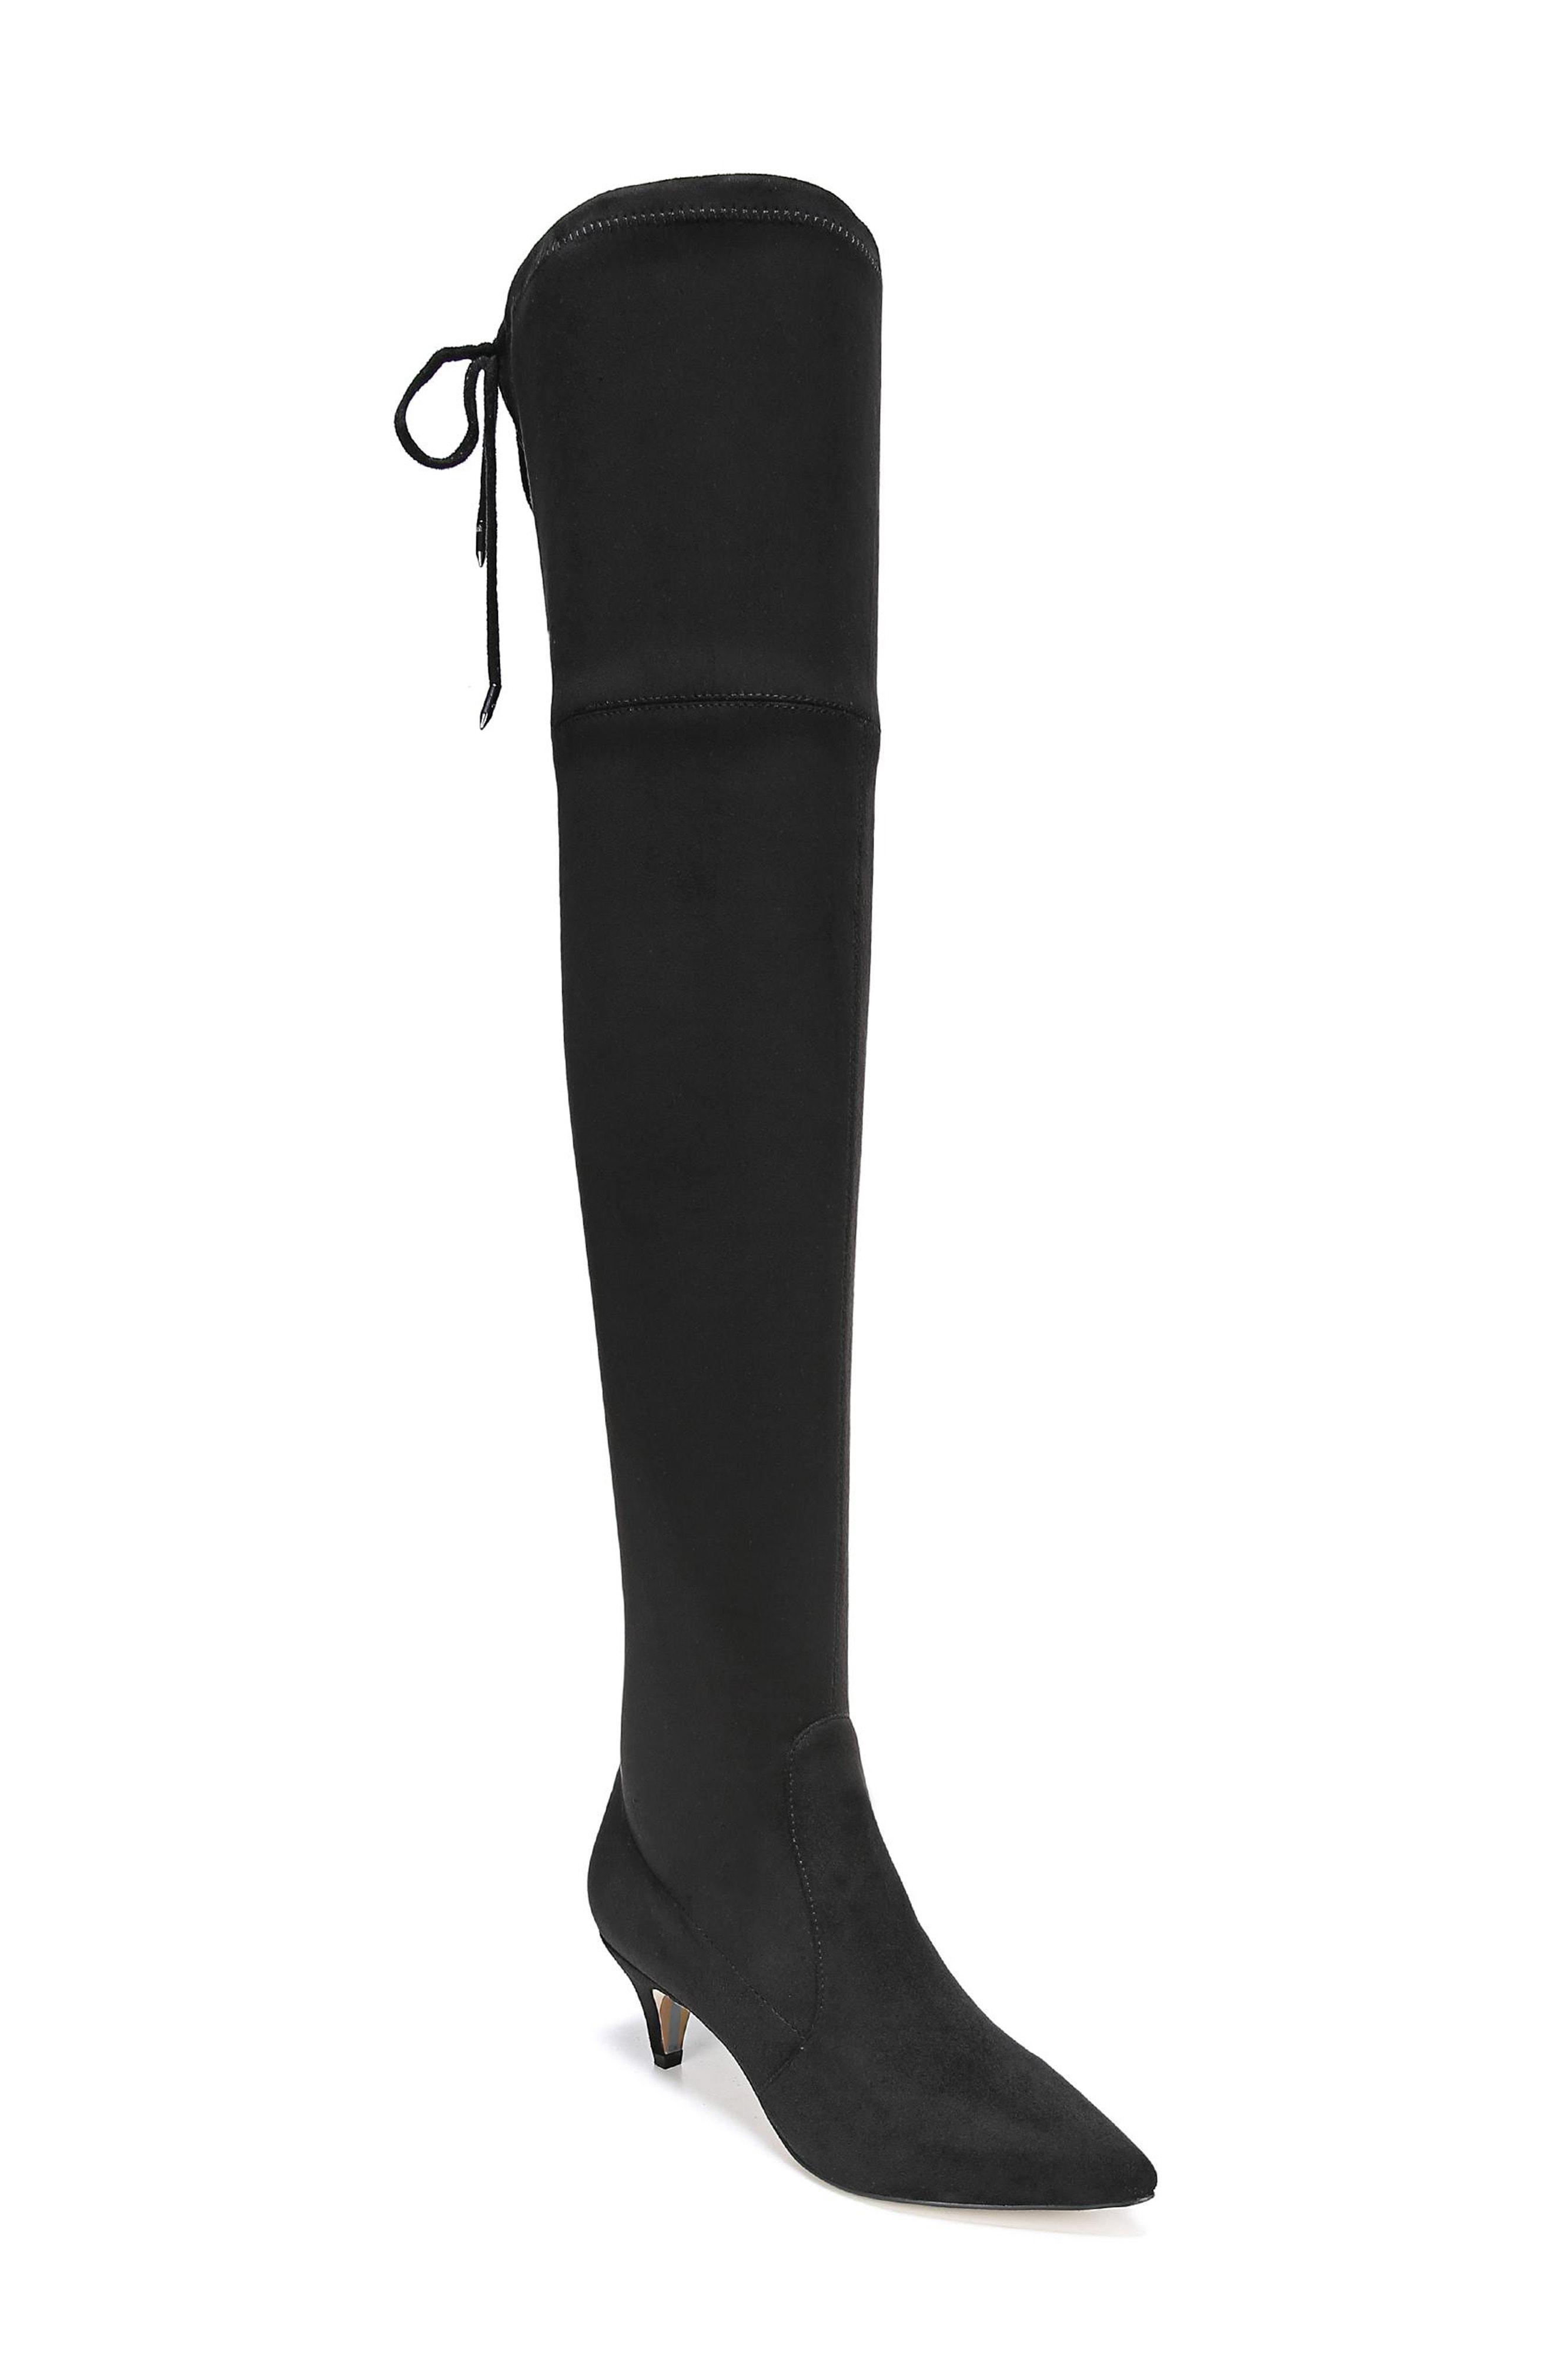 06c3d4be7d9 Lyst - Sam Edelman Kristie Over The Knee Boot in Black